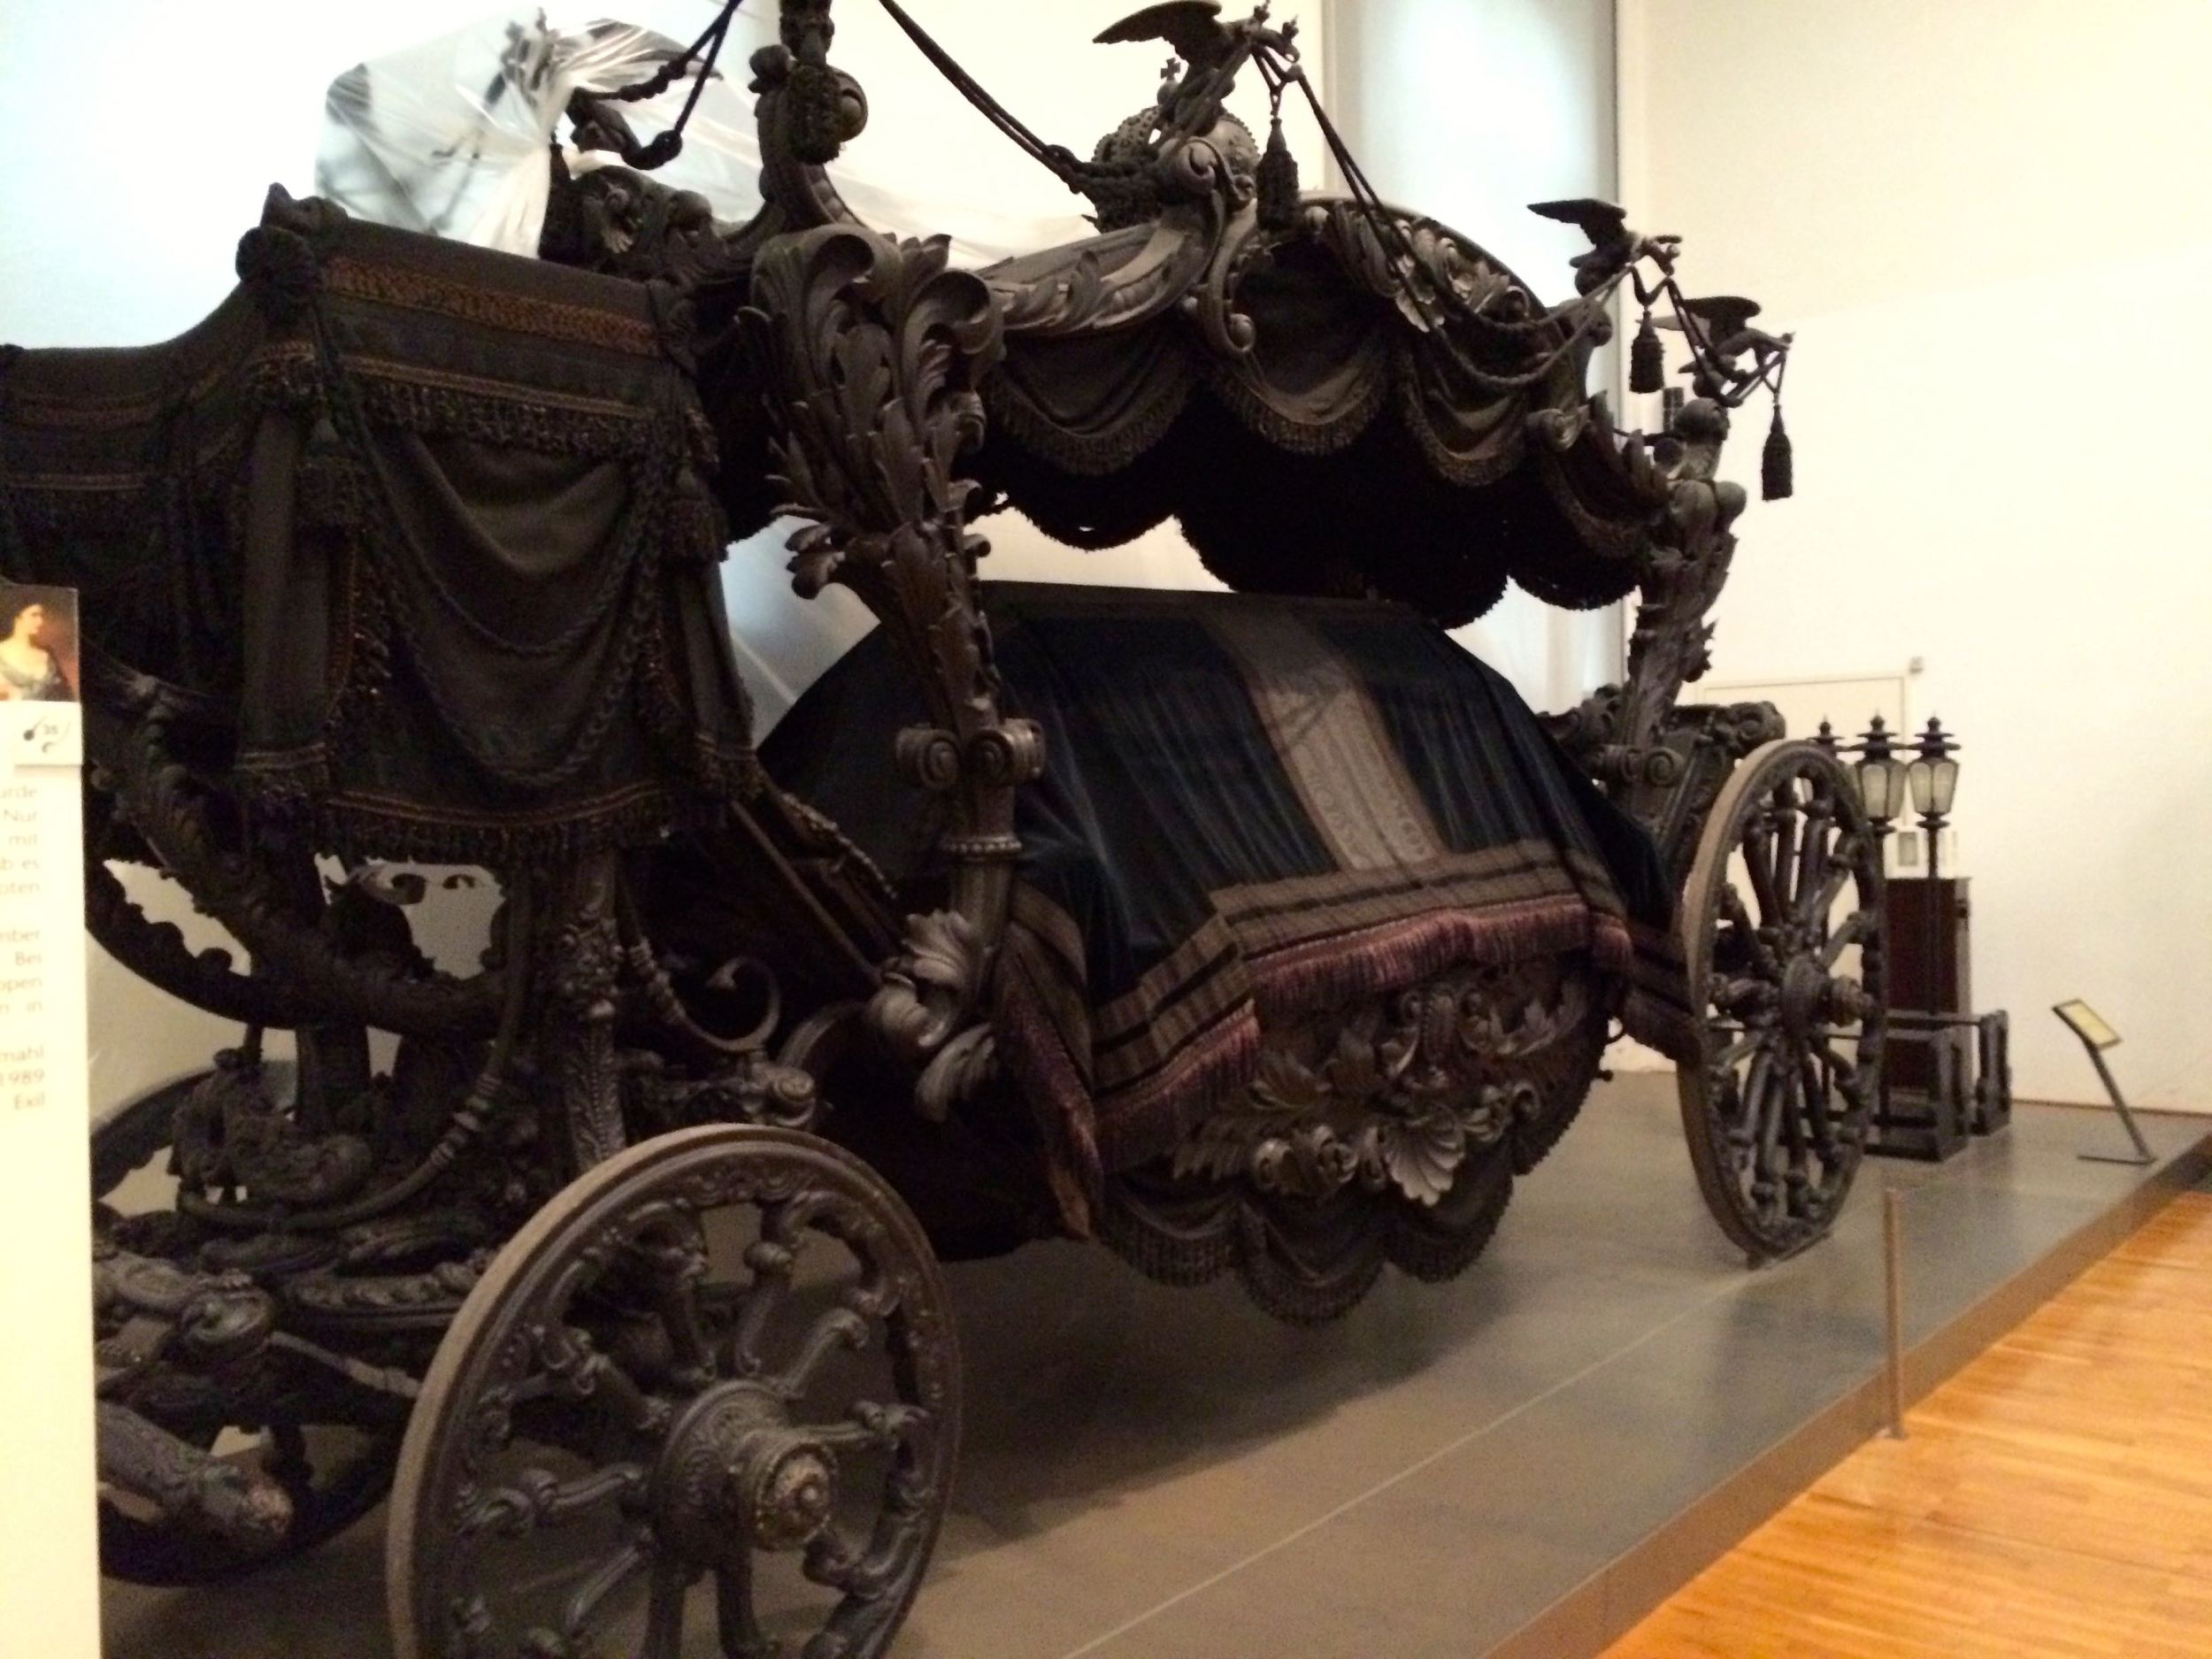 A hearse. Black on black. A tasteful way to mourn.